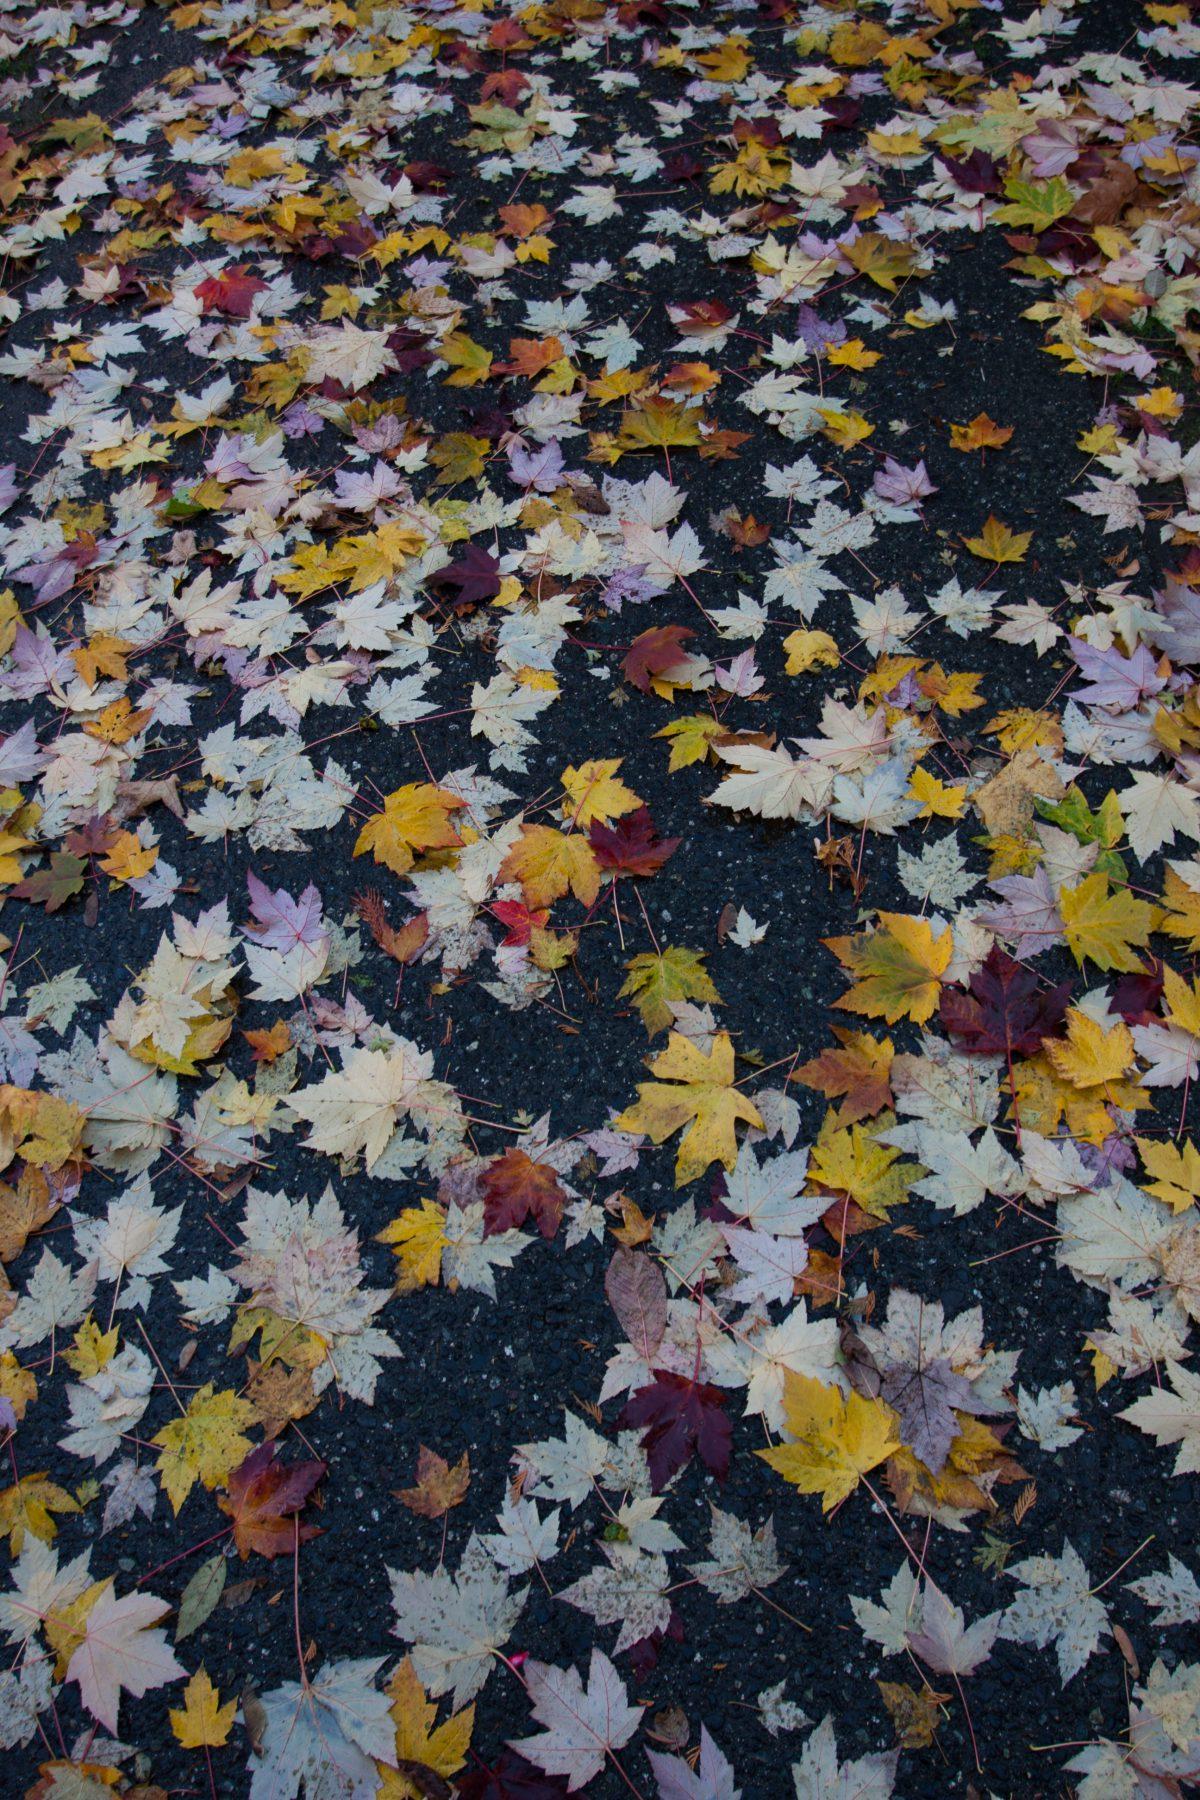 Leaf blanket, leaf, autumn